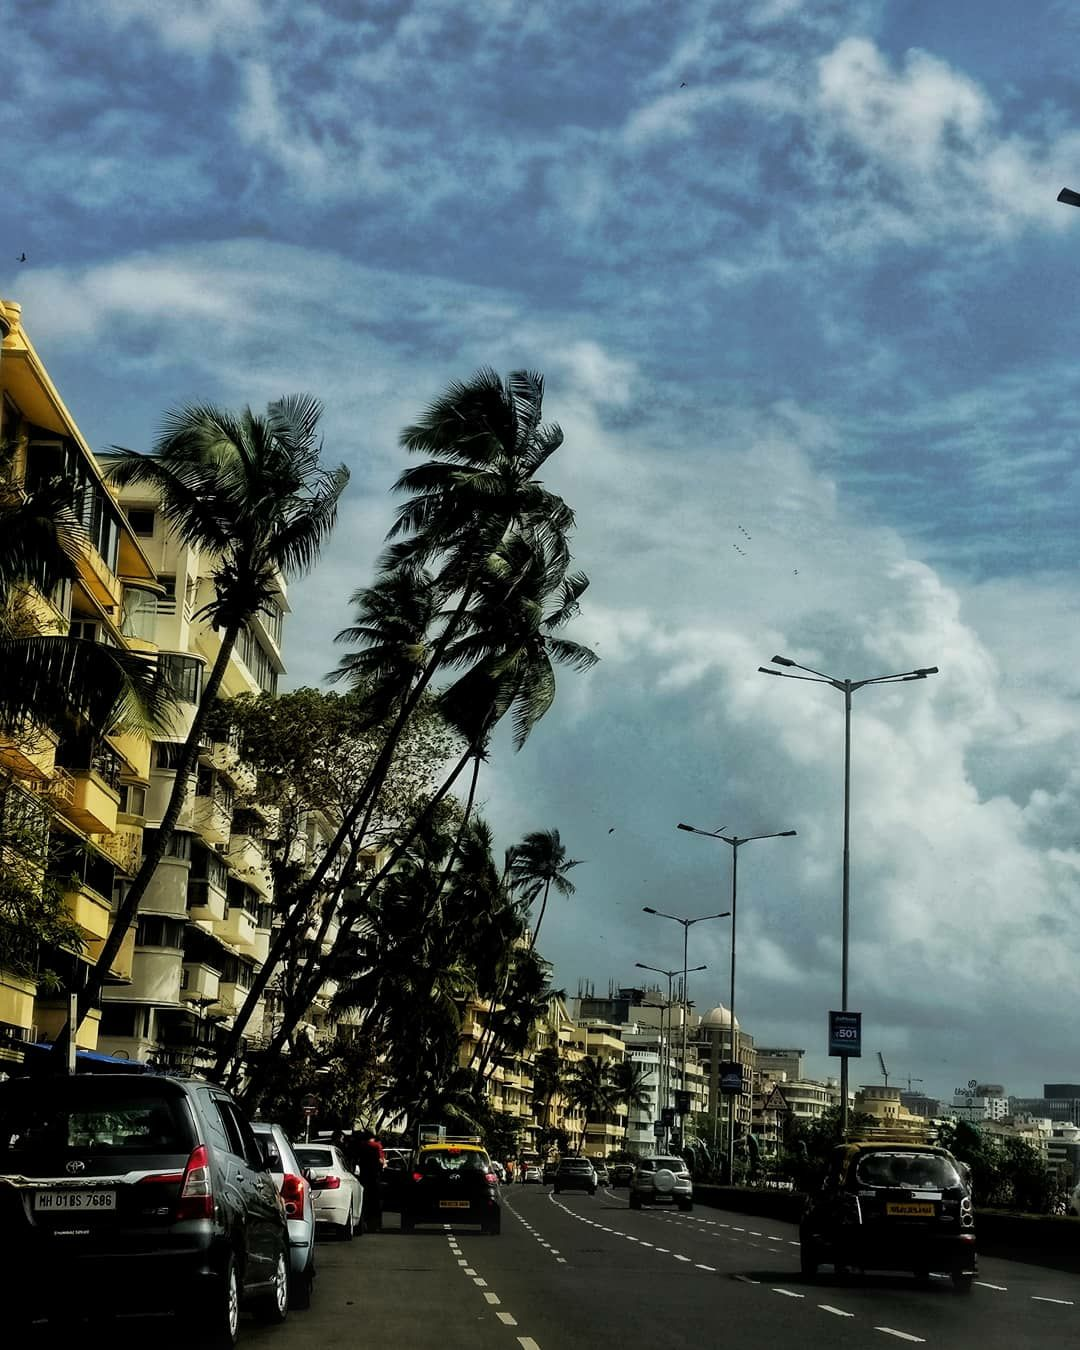 Photo of Marine Drive By abhijeet bhalgat